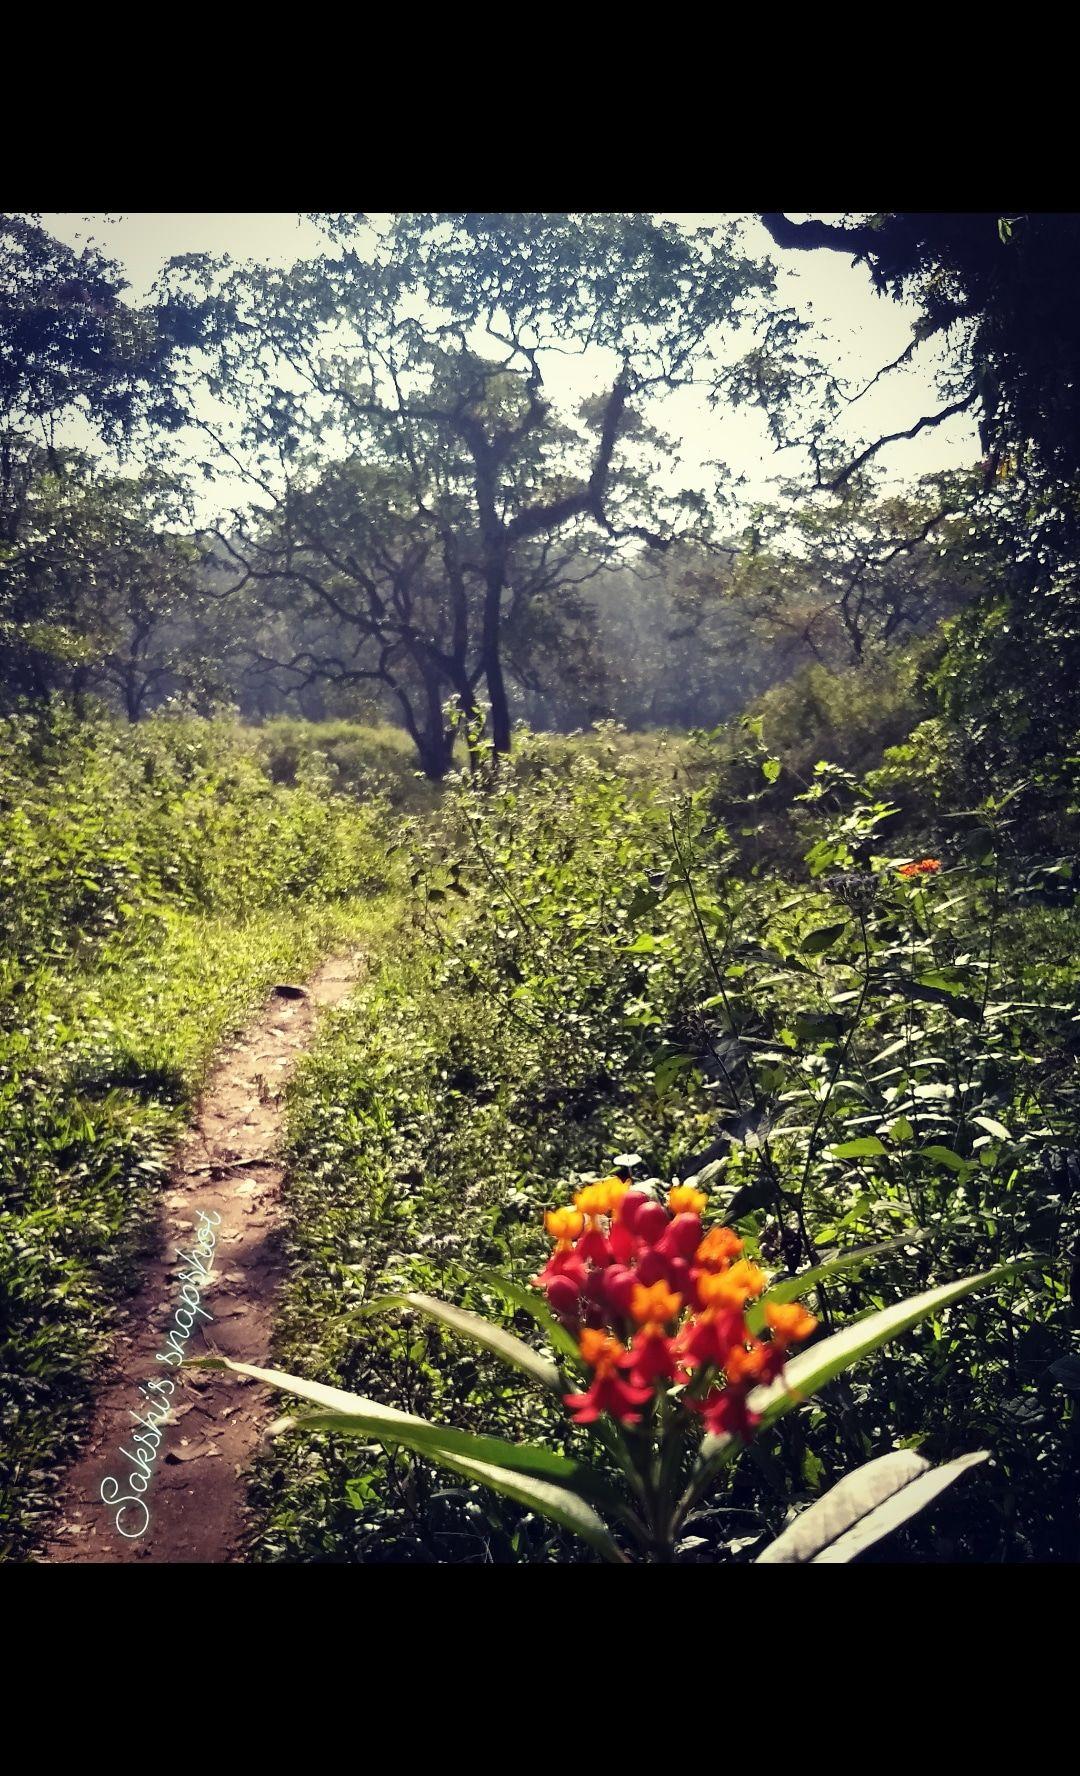 Photo of Periyar Tiger Reserve By sakshi mehta